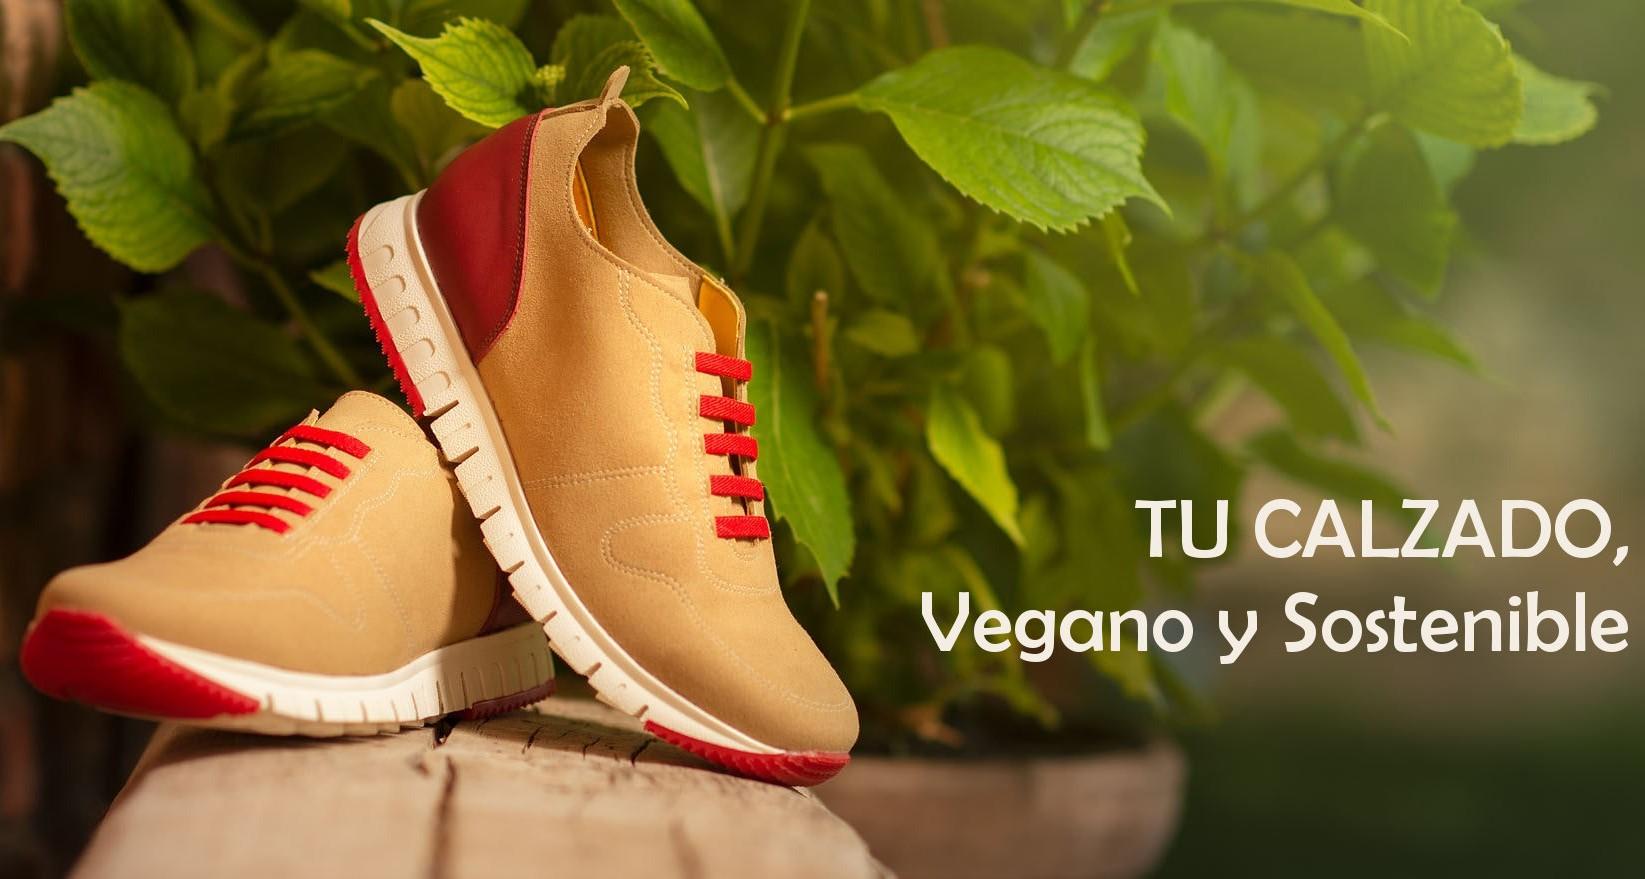 Ekoalkesan calzado vegano made in spain _